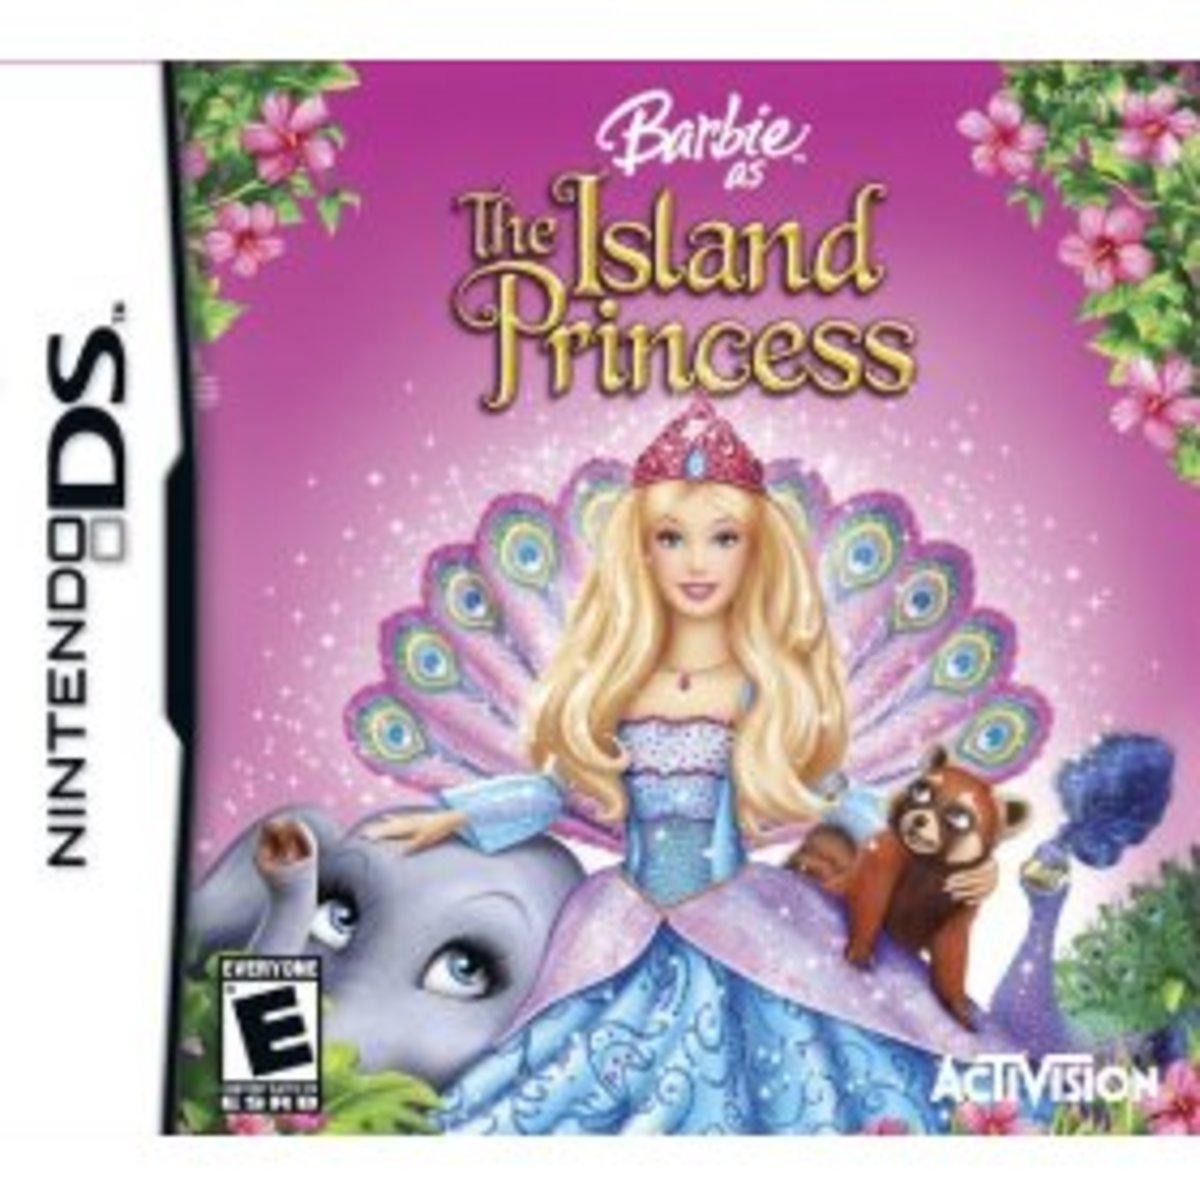 Barbie island Princess for Nintendo DSi - Best Girl's DSi Game!